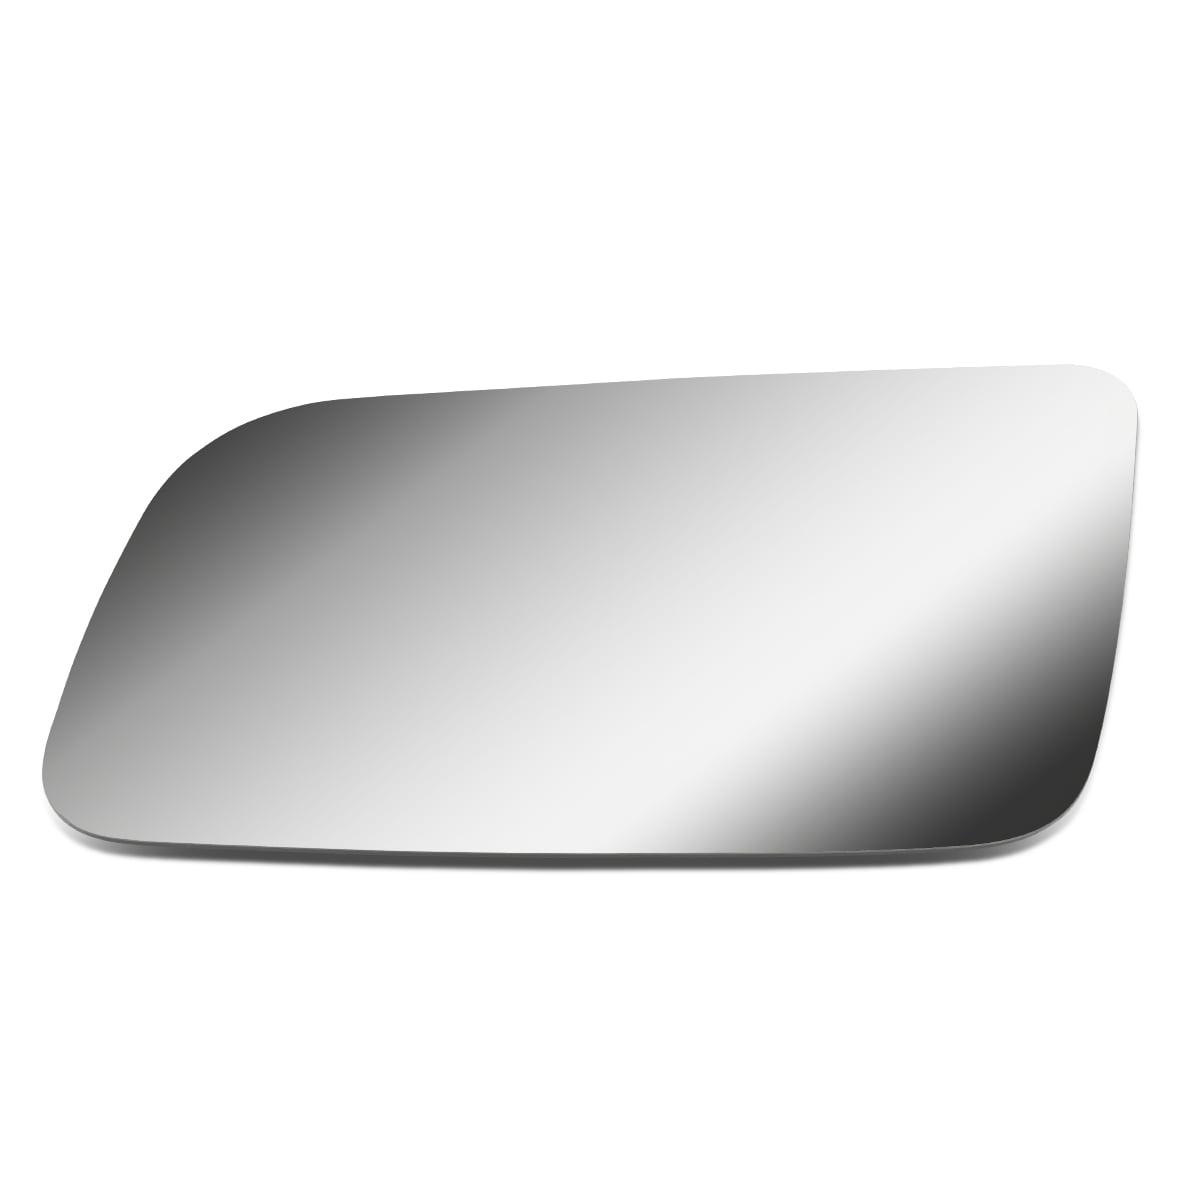 For 1985 To 2005 Chevy Astro Gmc Safari Left Side Door Rear View Mirror Glass Replacement Lens 86 87 88 89 90 91 92 93 94 95 96 97 98 99 01 02 03 04 Walmart Com Walmart Com